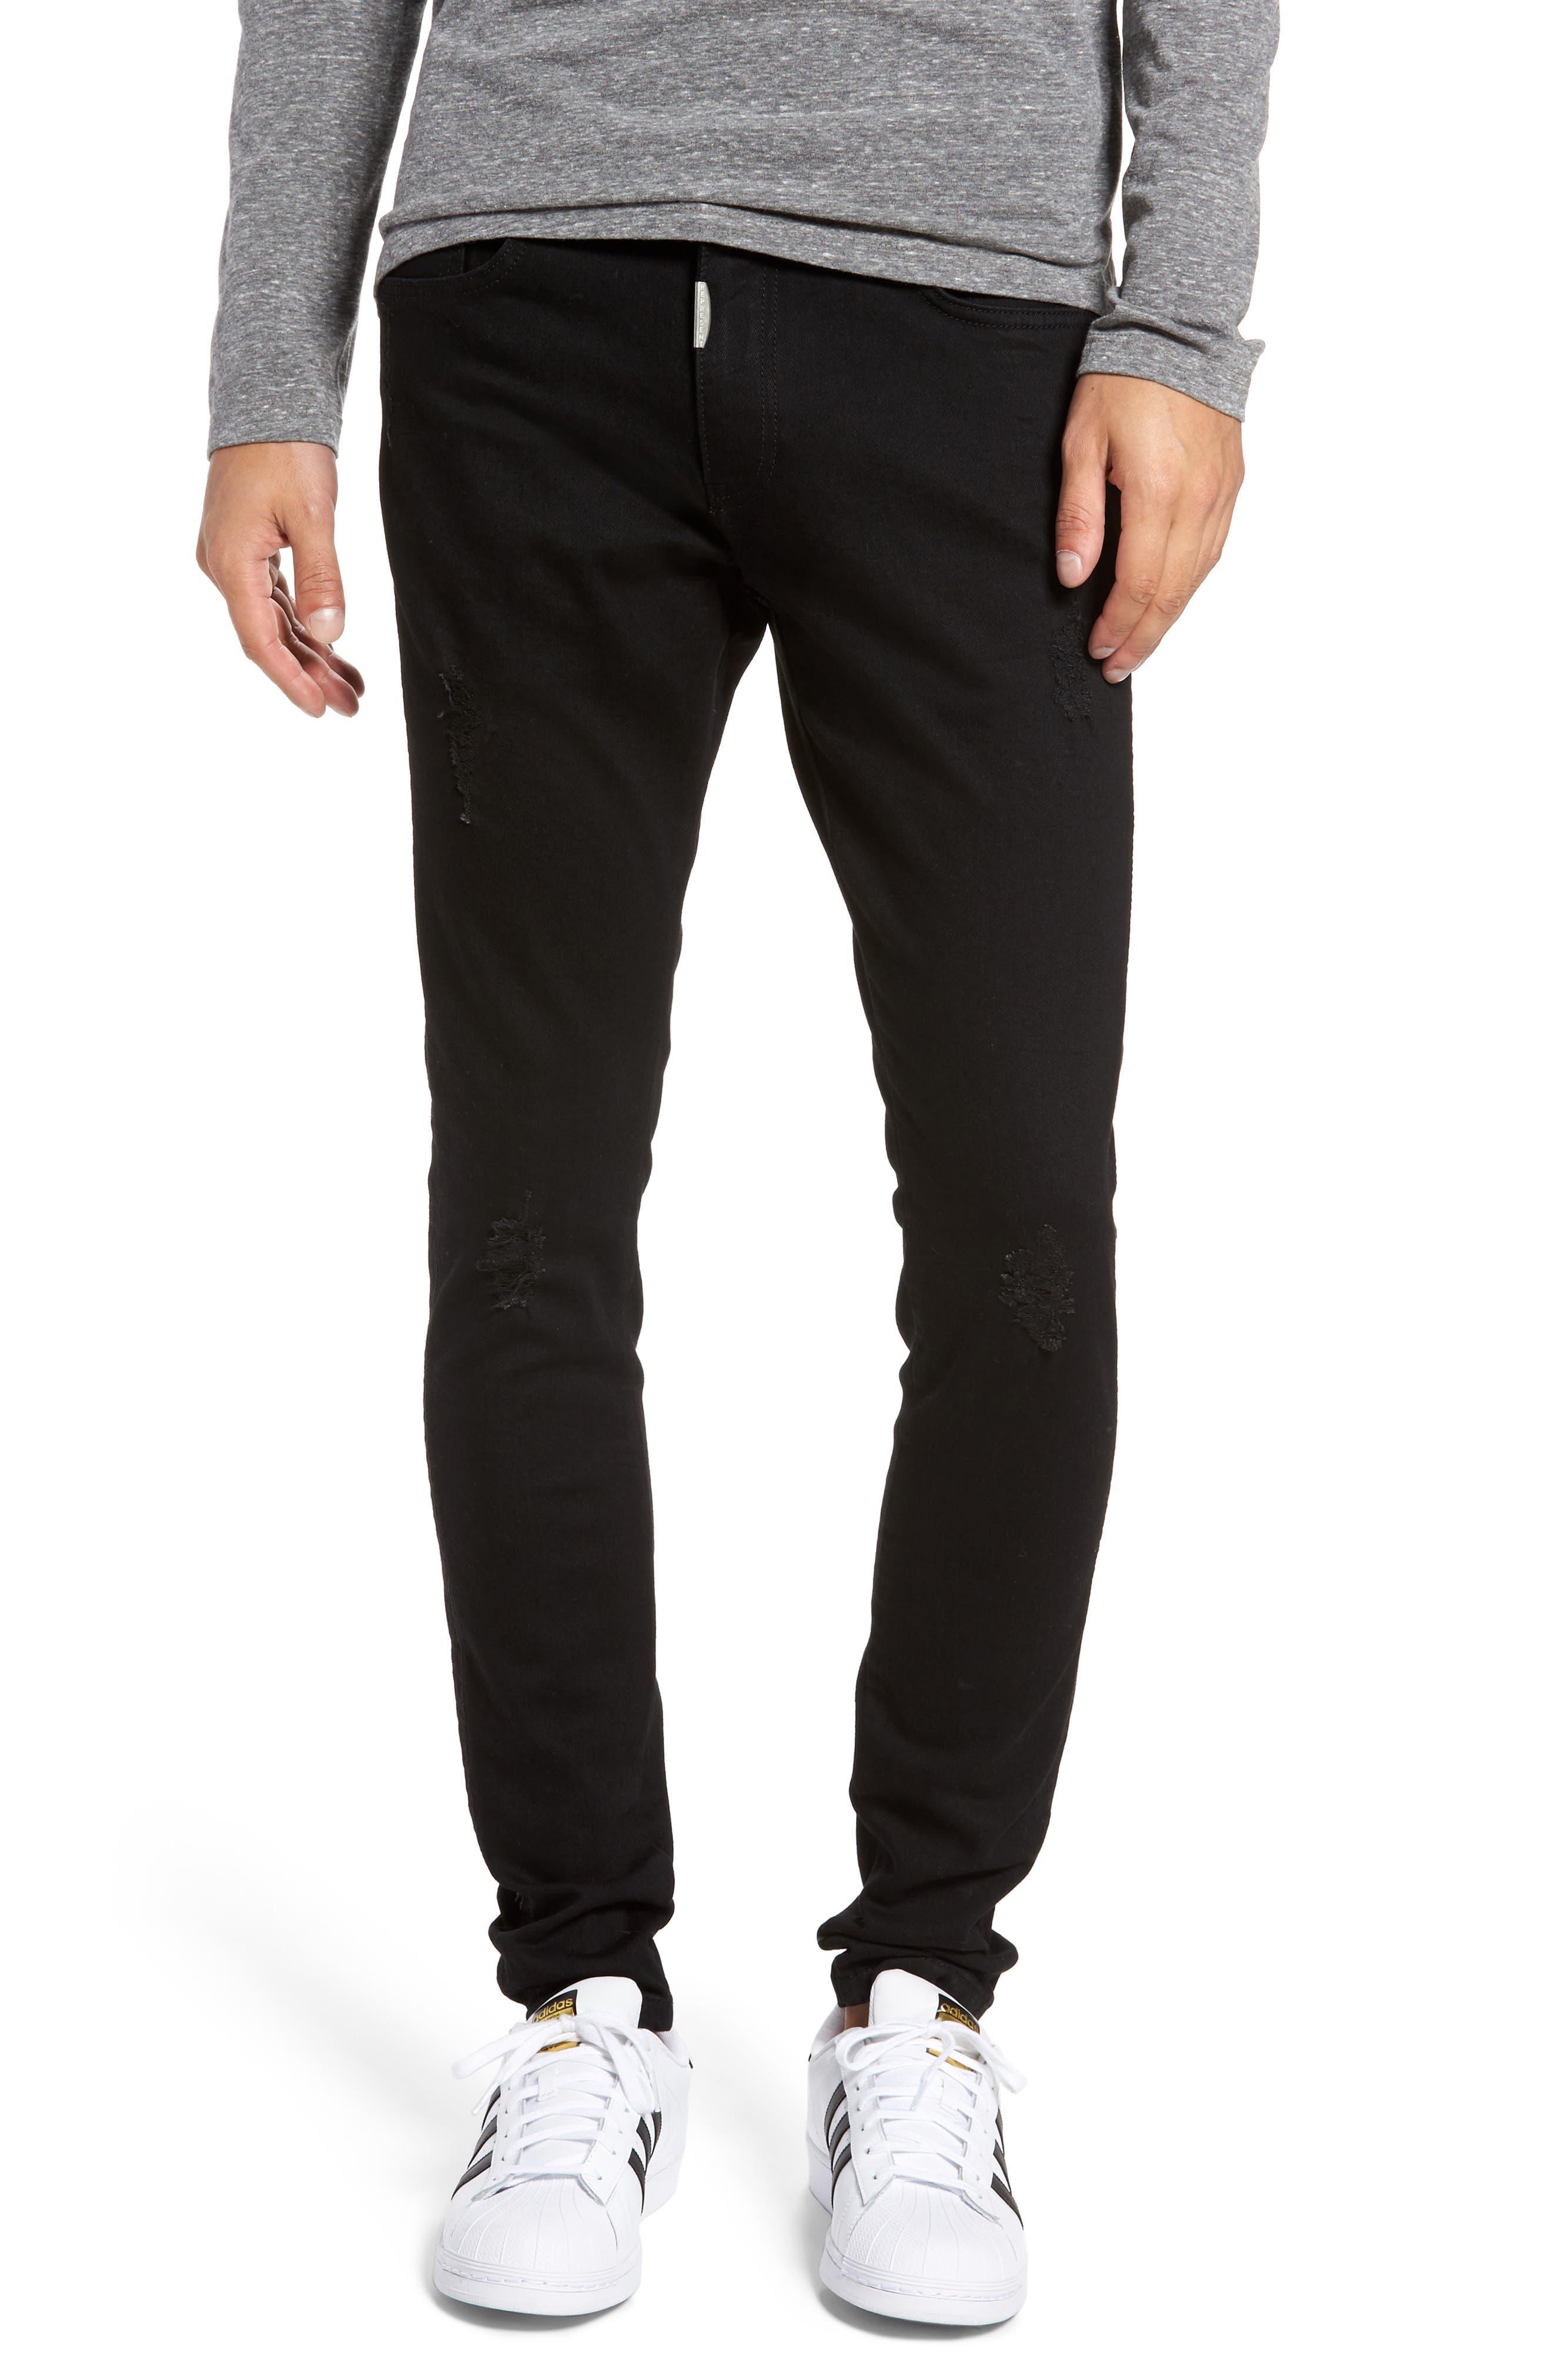 Alternate Image 1 Selected - Represent Slim Fit Distressed Jeans